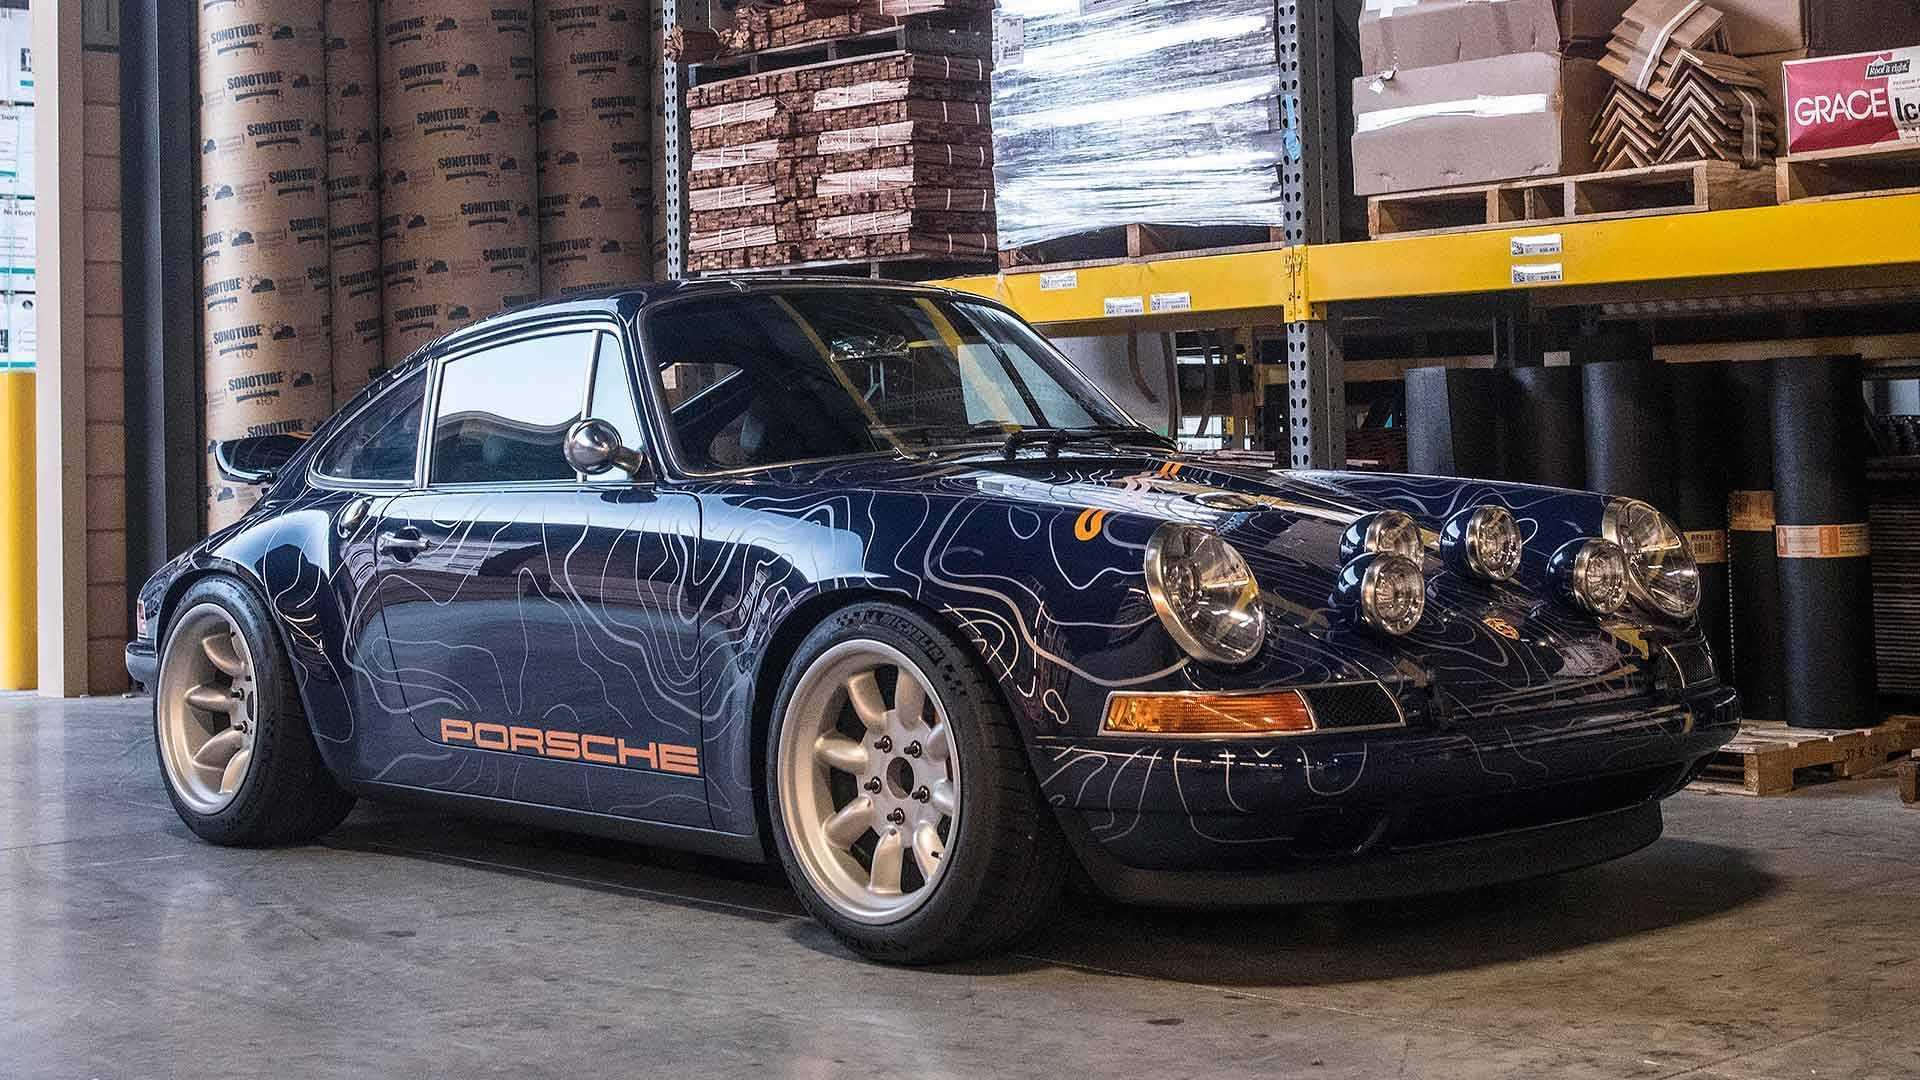 Singer Reimagines Porsche 911 As 1970s Canyon Carver